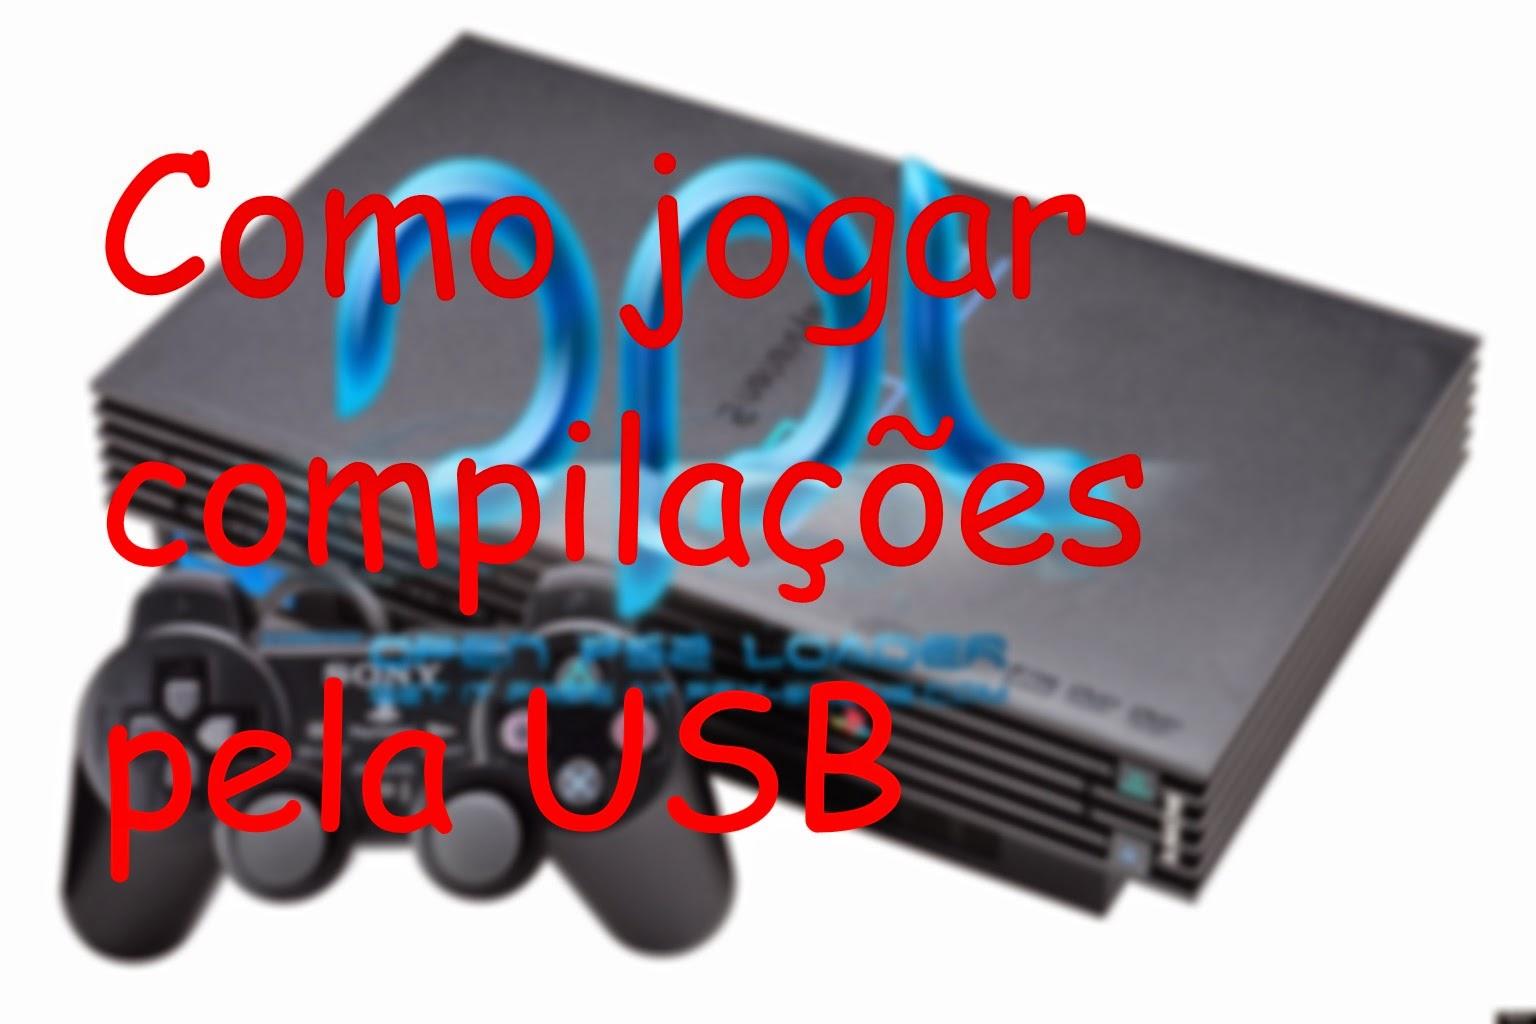 Usbextreme usbadvance usb loader for the ps2 : tingchildpen